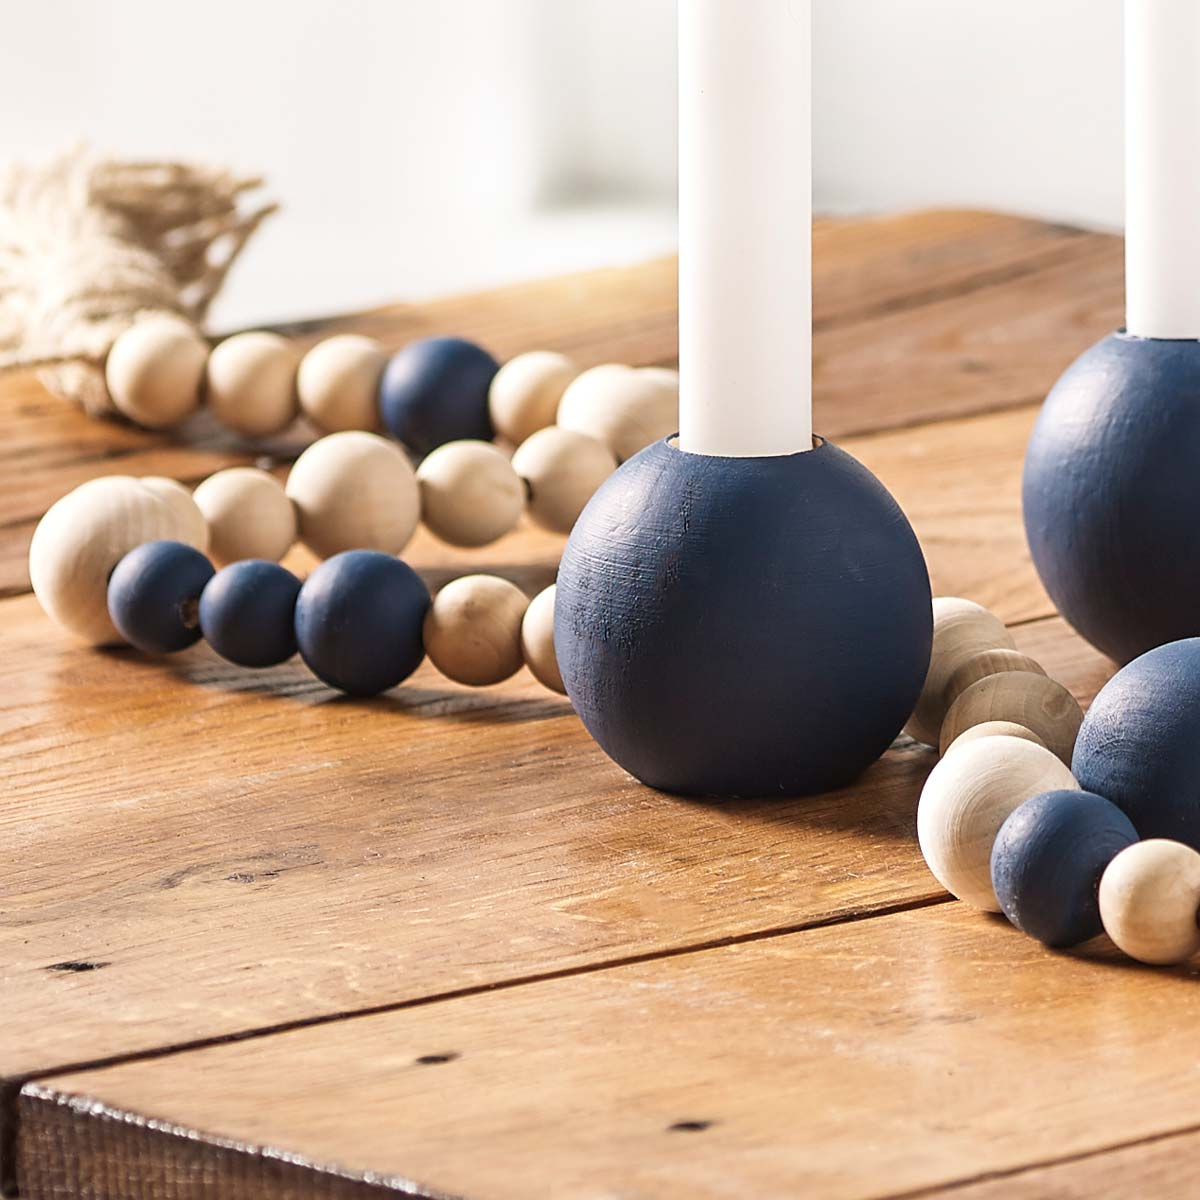 DIY Painted Candleholders & Centerpiece Idea